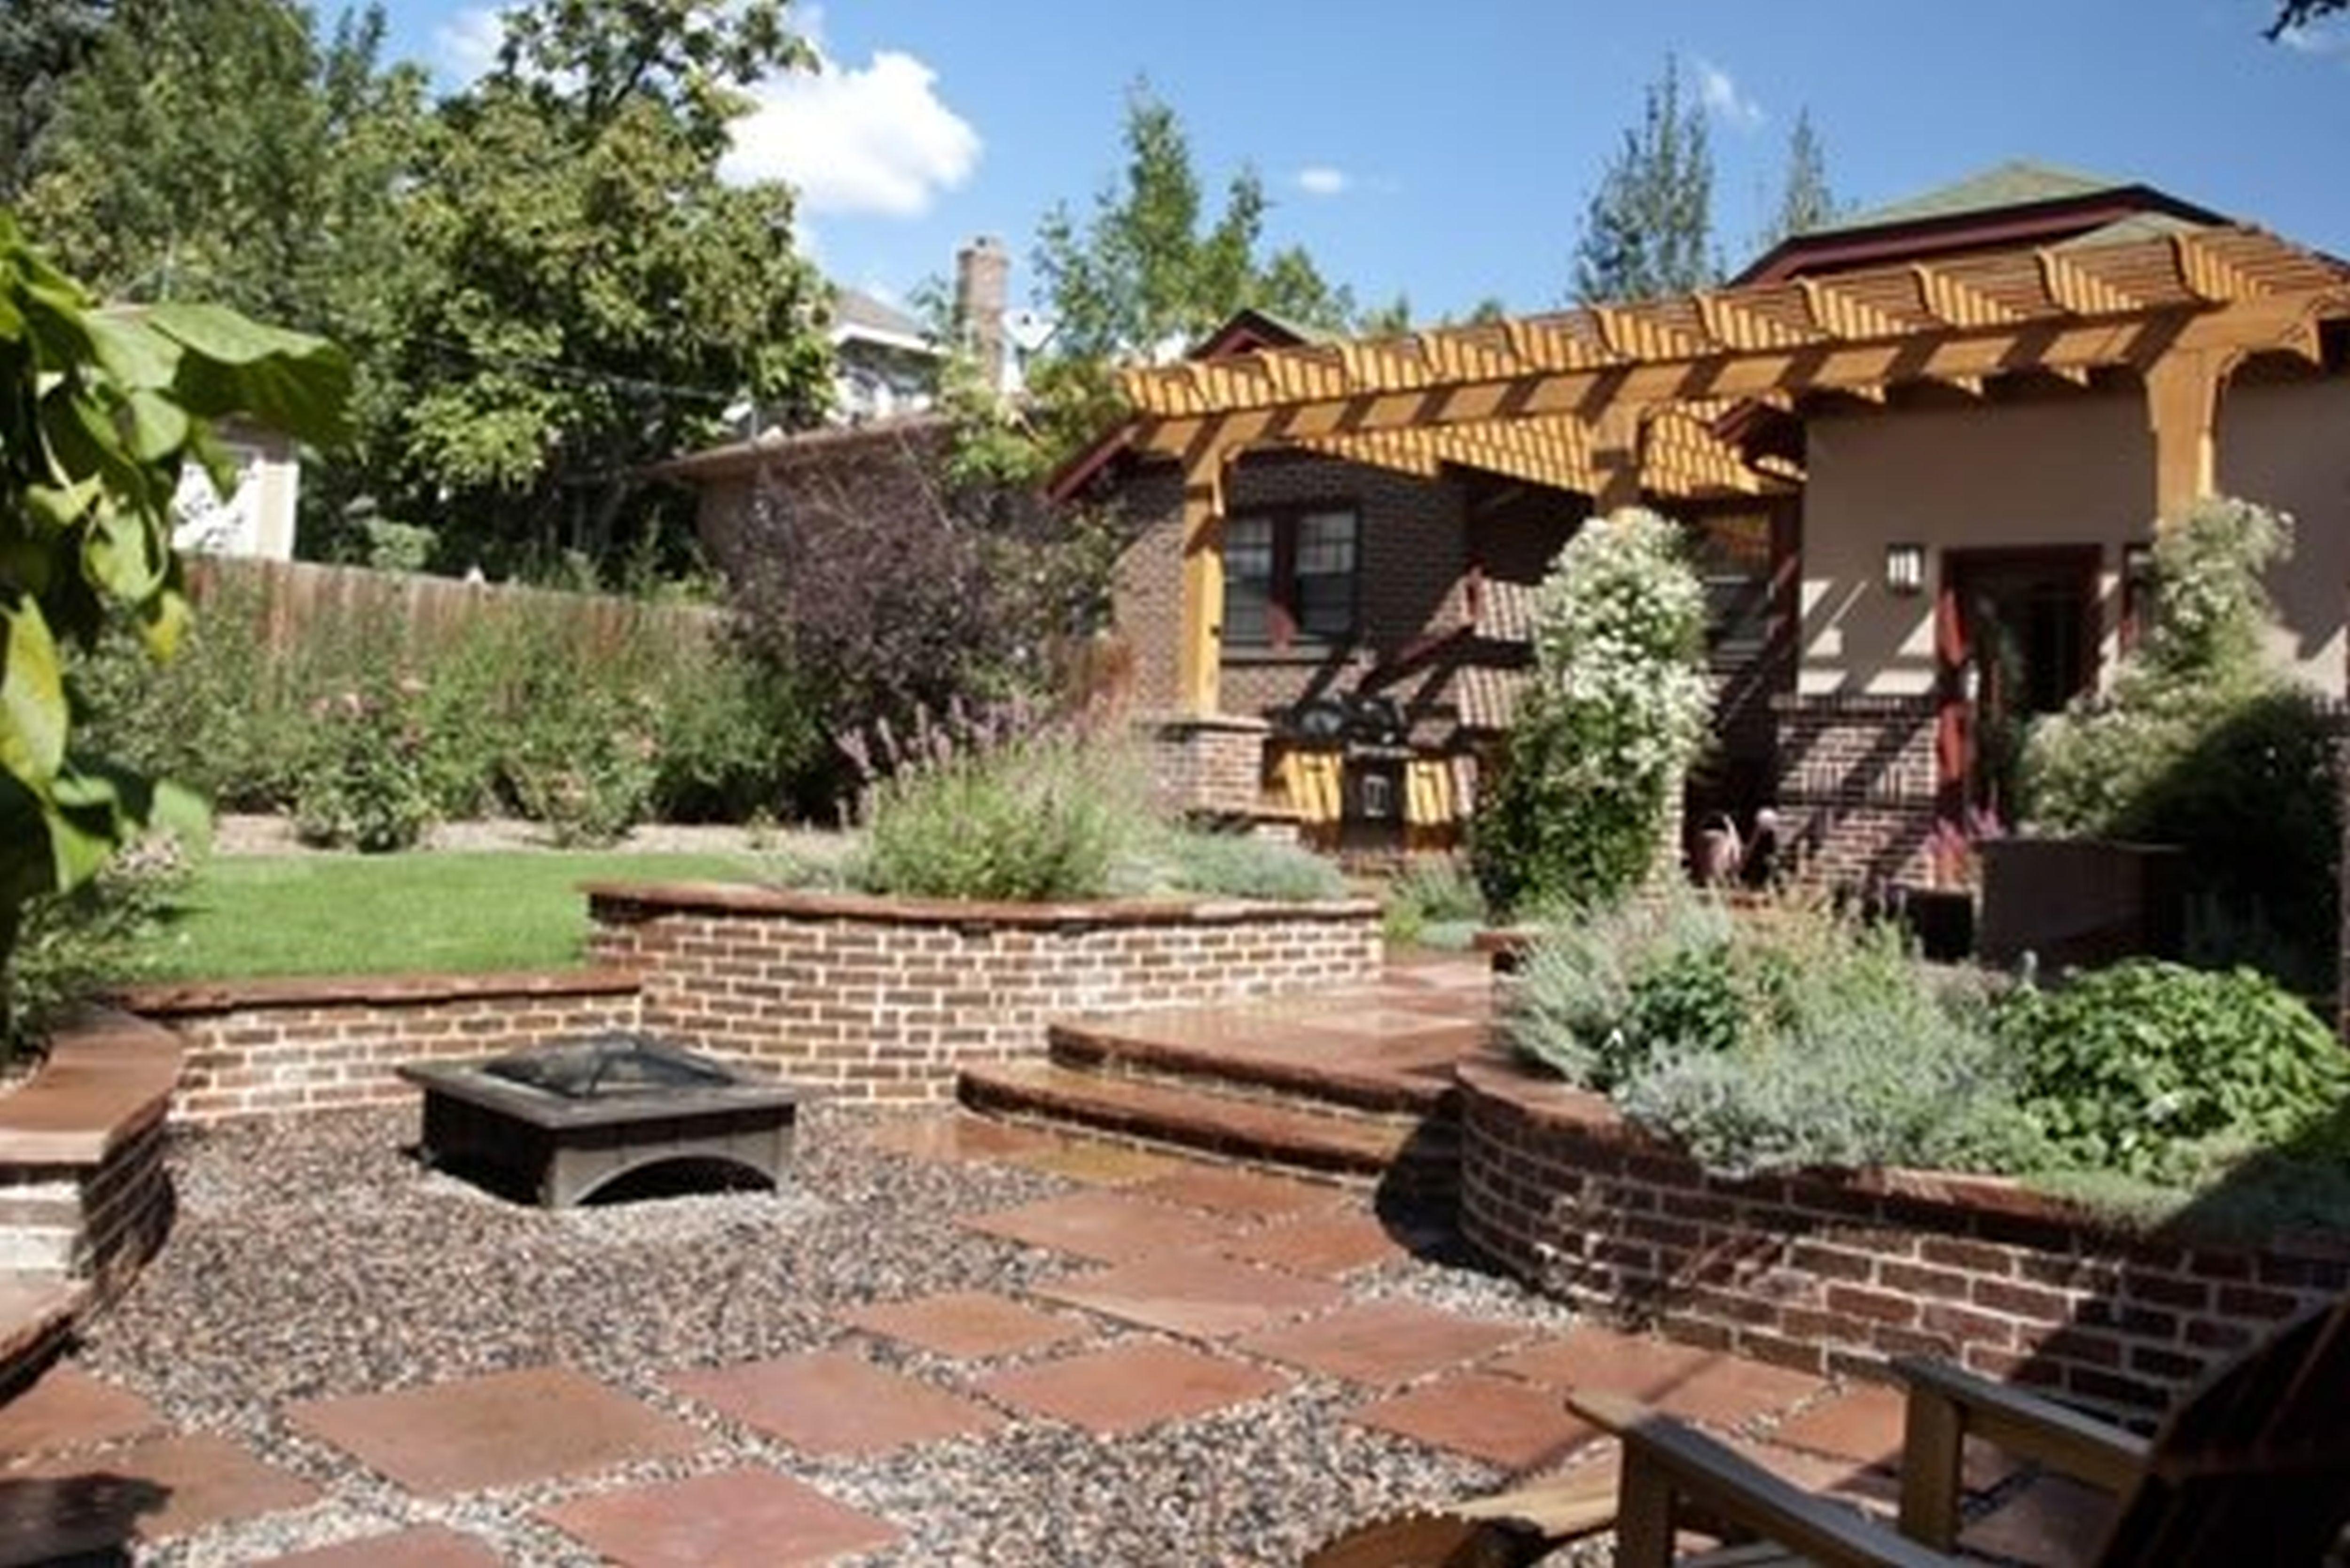 10 Ways How to Improve Backyard Deck Ideas   Desert ... on Desert Landscape Ideas For Backyards id=29768